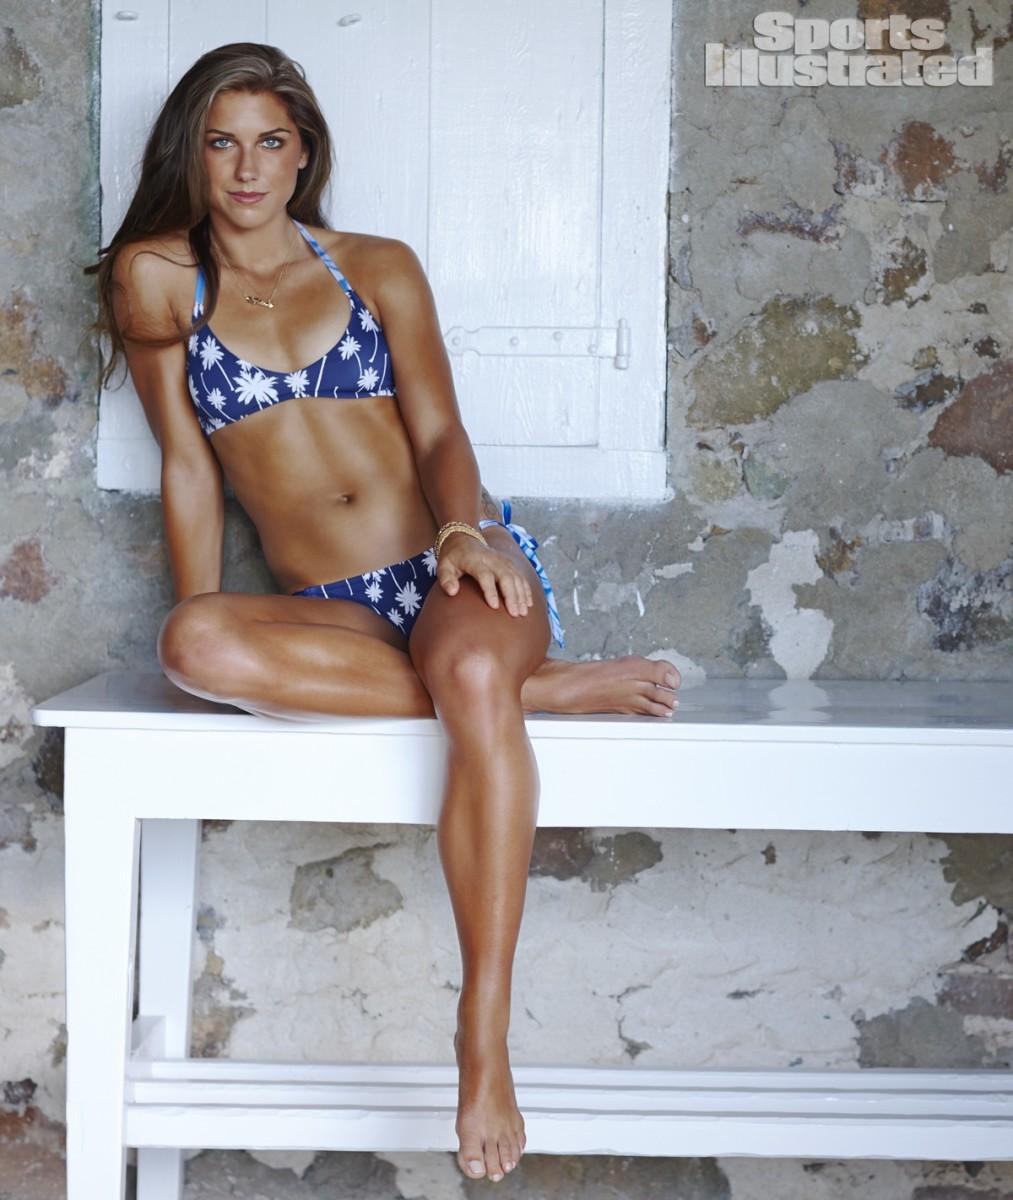 Alex Morgan 2014 Swimsuit 12